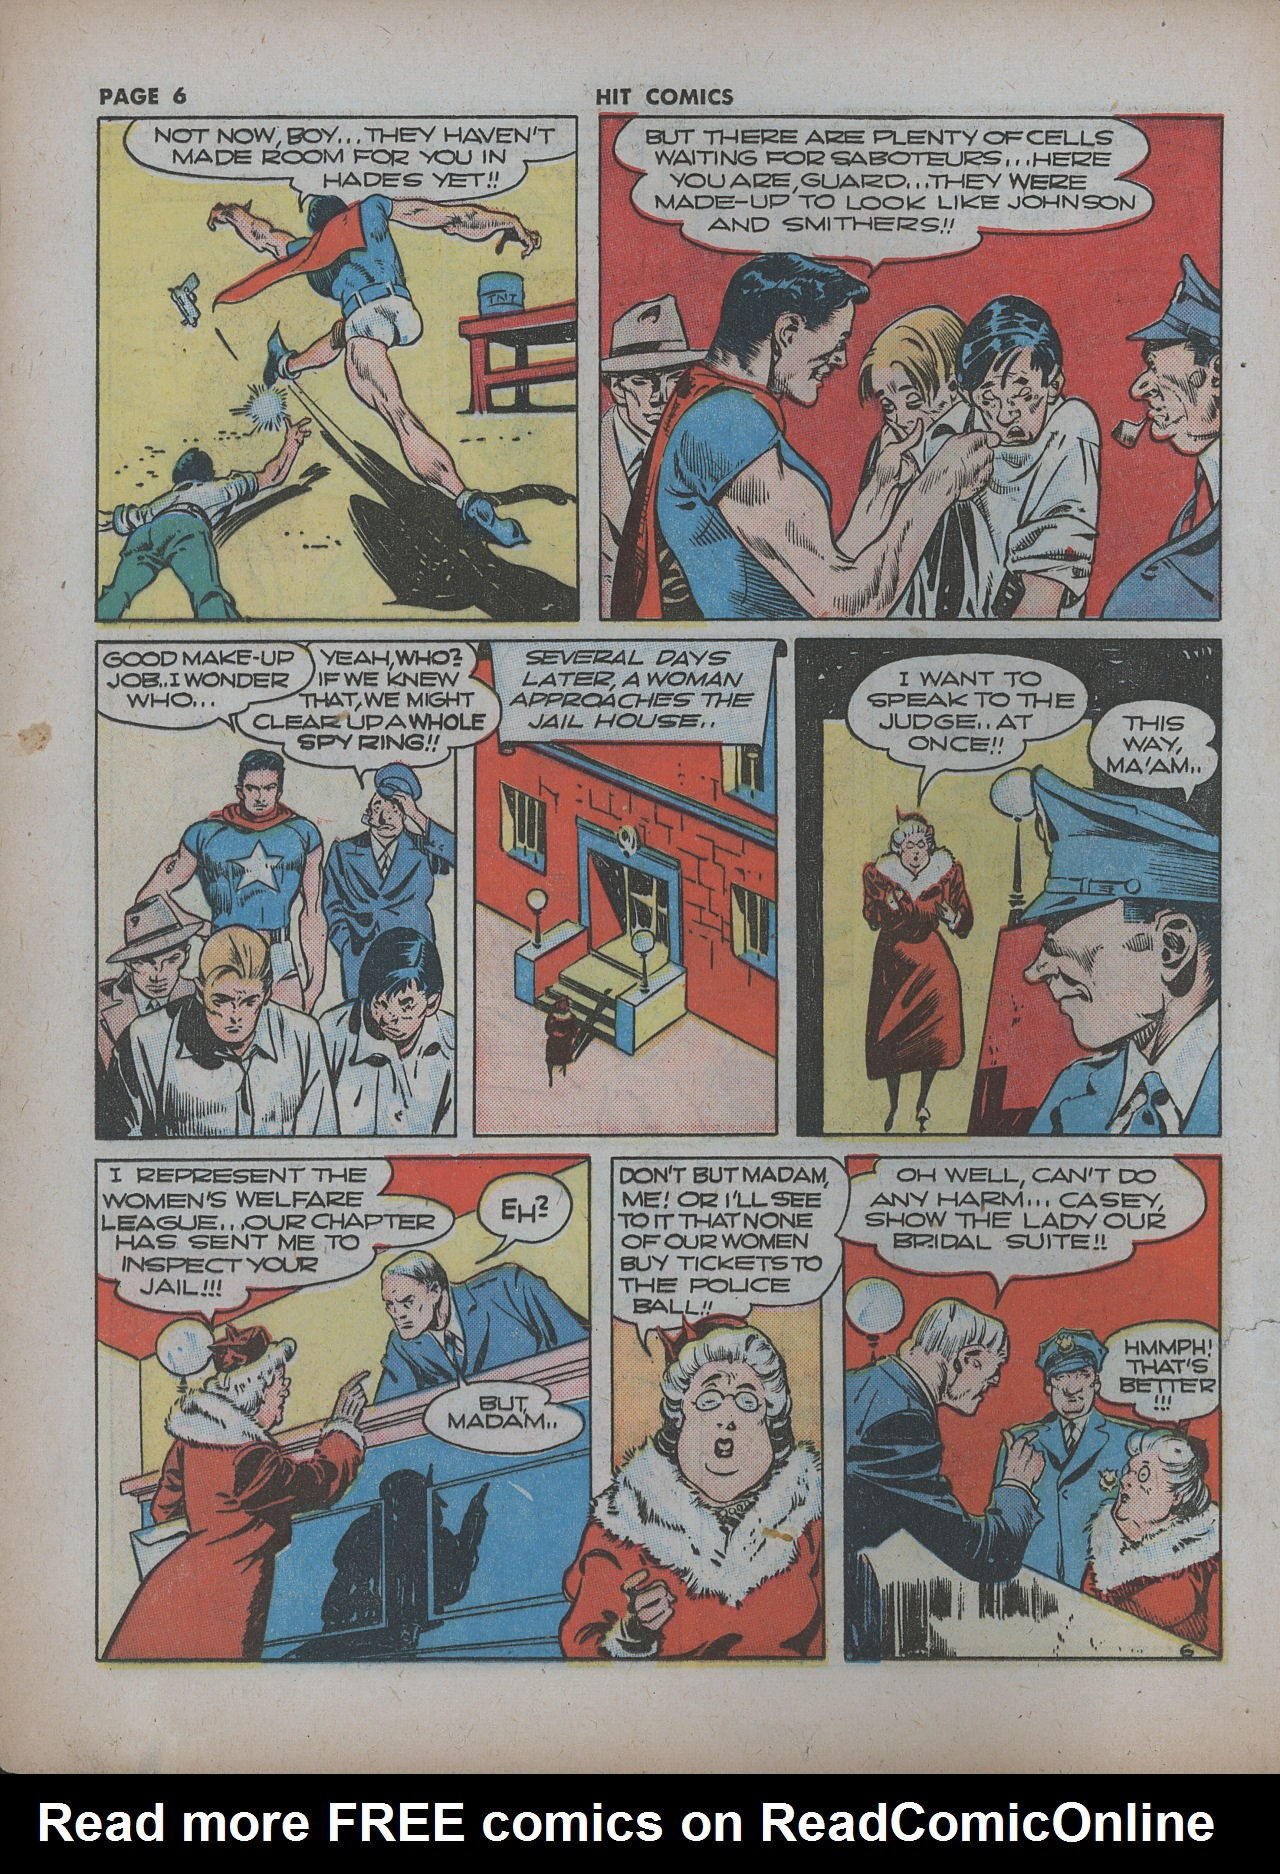 Read online Hit Comics comic -  Issue #22 - 8